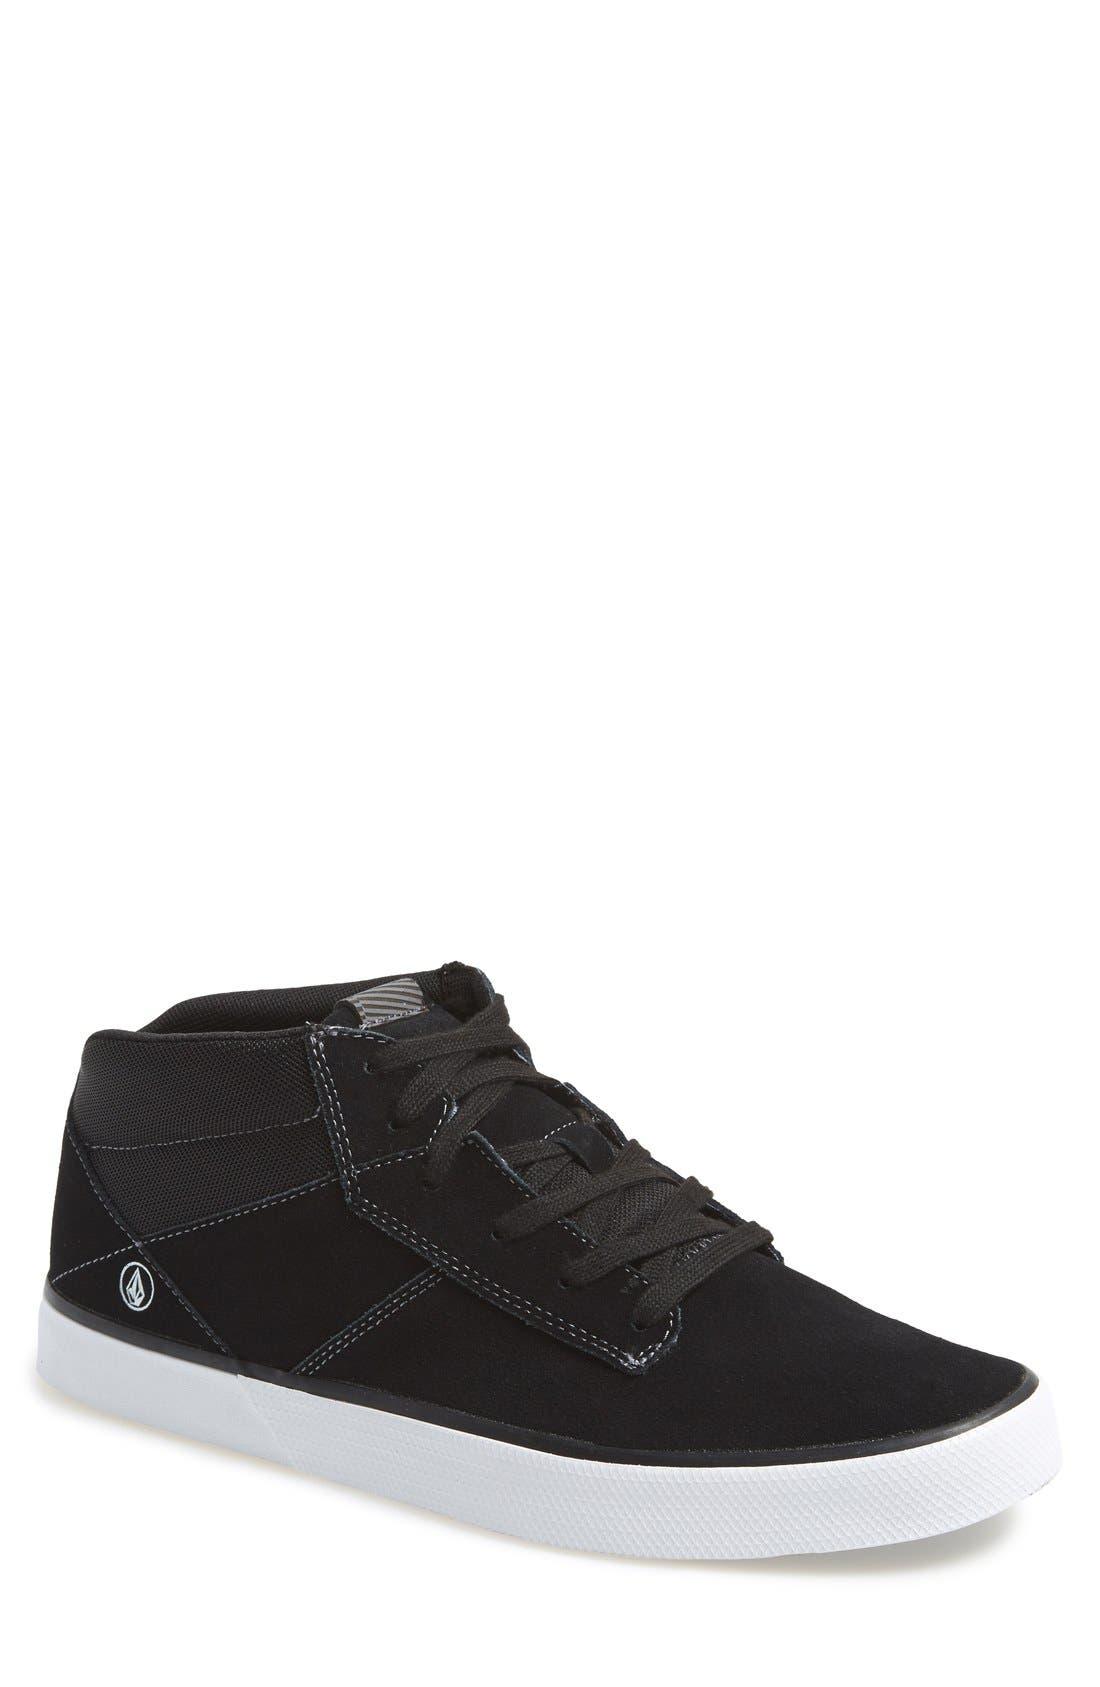 'Grimm Mid 2' Sneaker,                             Main thumbnail 1, color,                             018